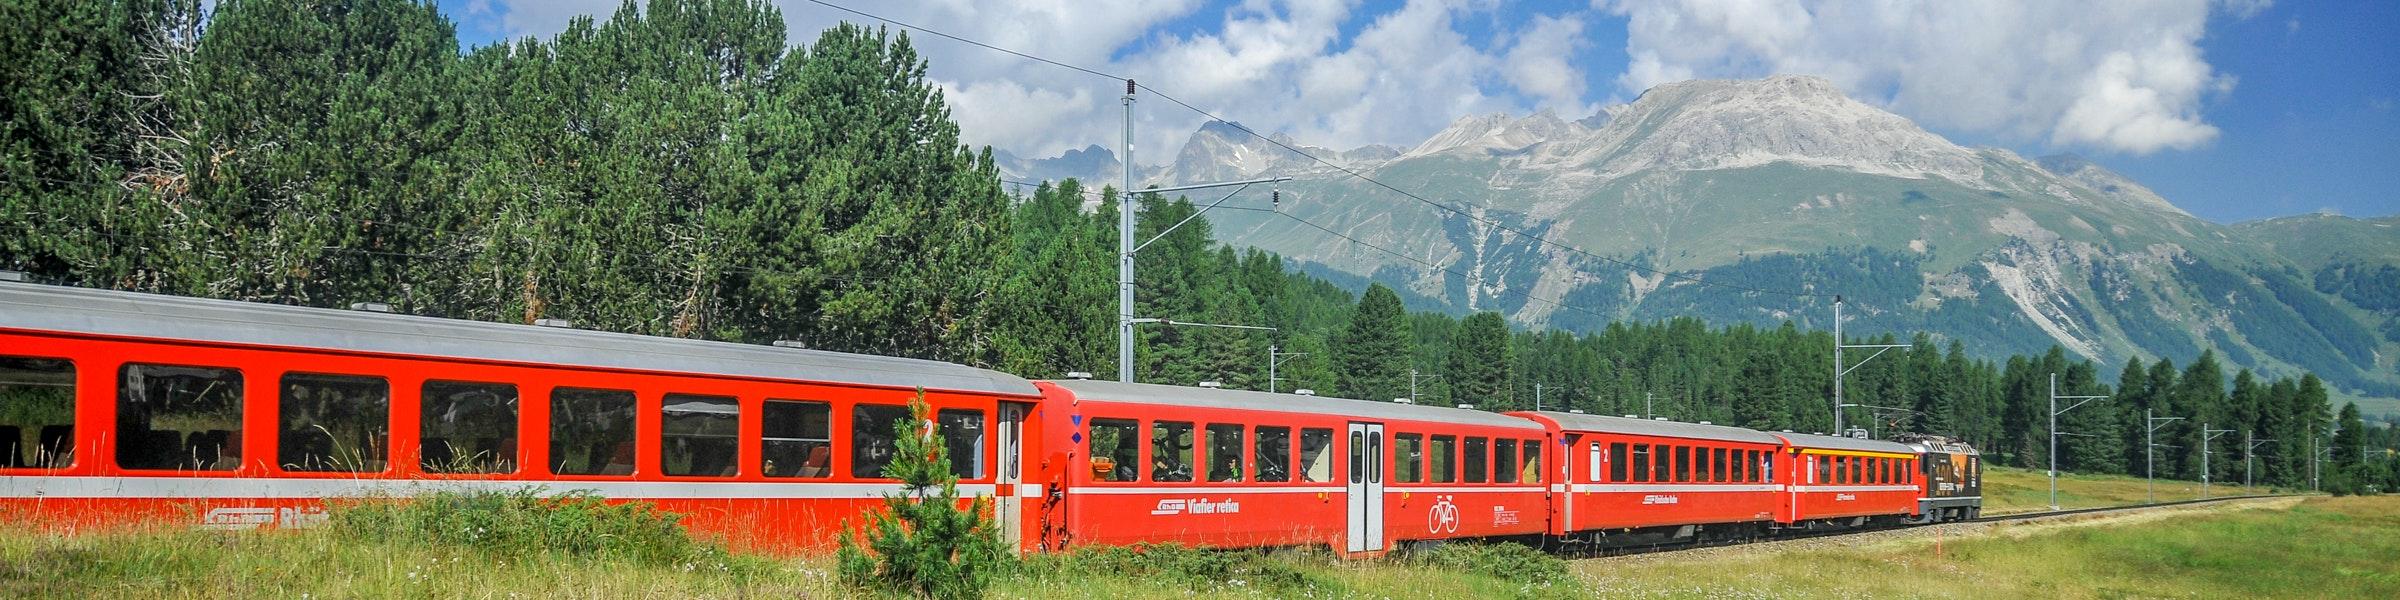 Train in Bever Valley